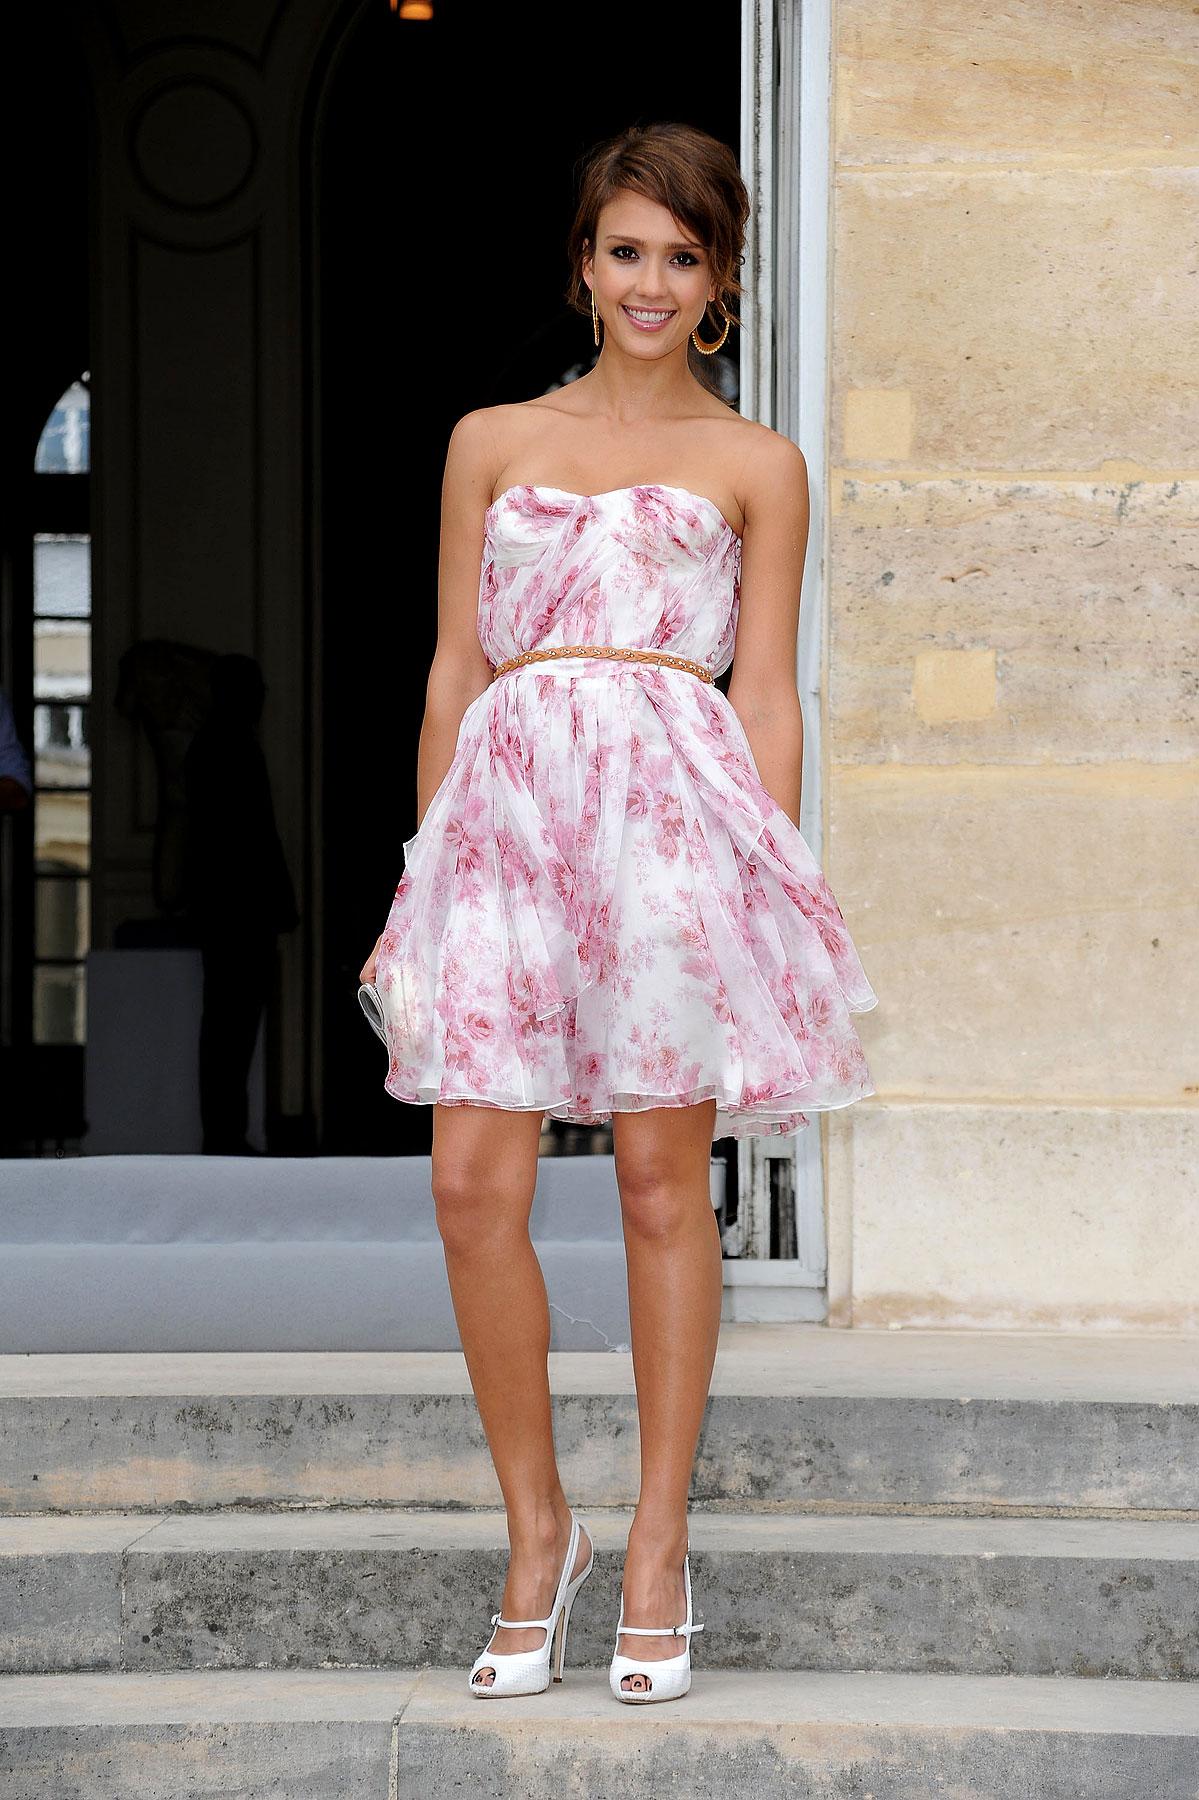 Jessica Alba Is Tres Chic at Paris Fashion Week (PHOTOS)